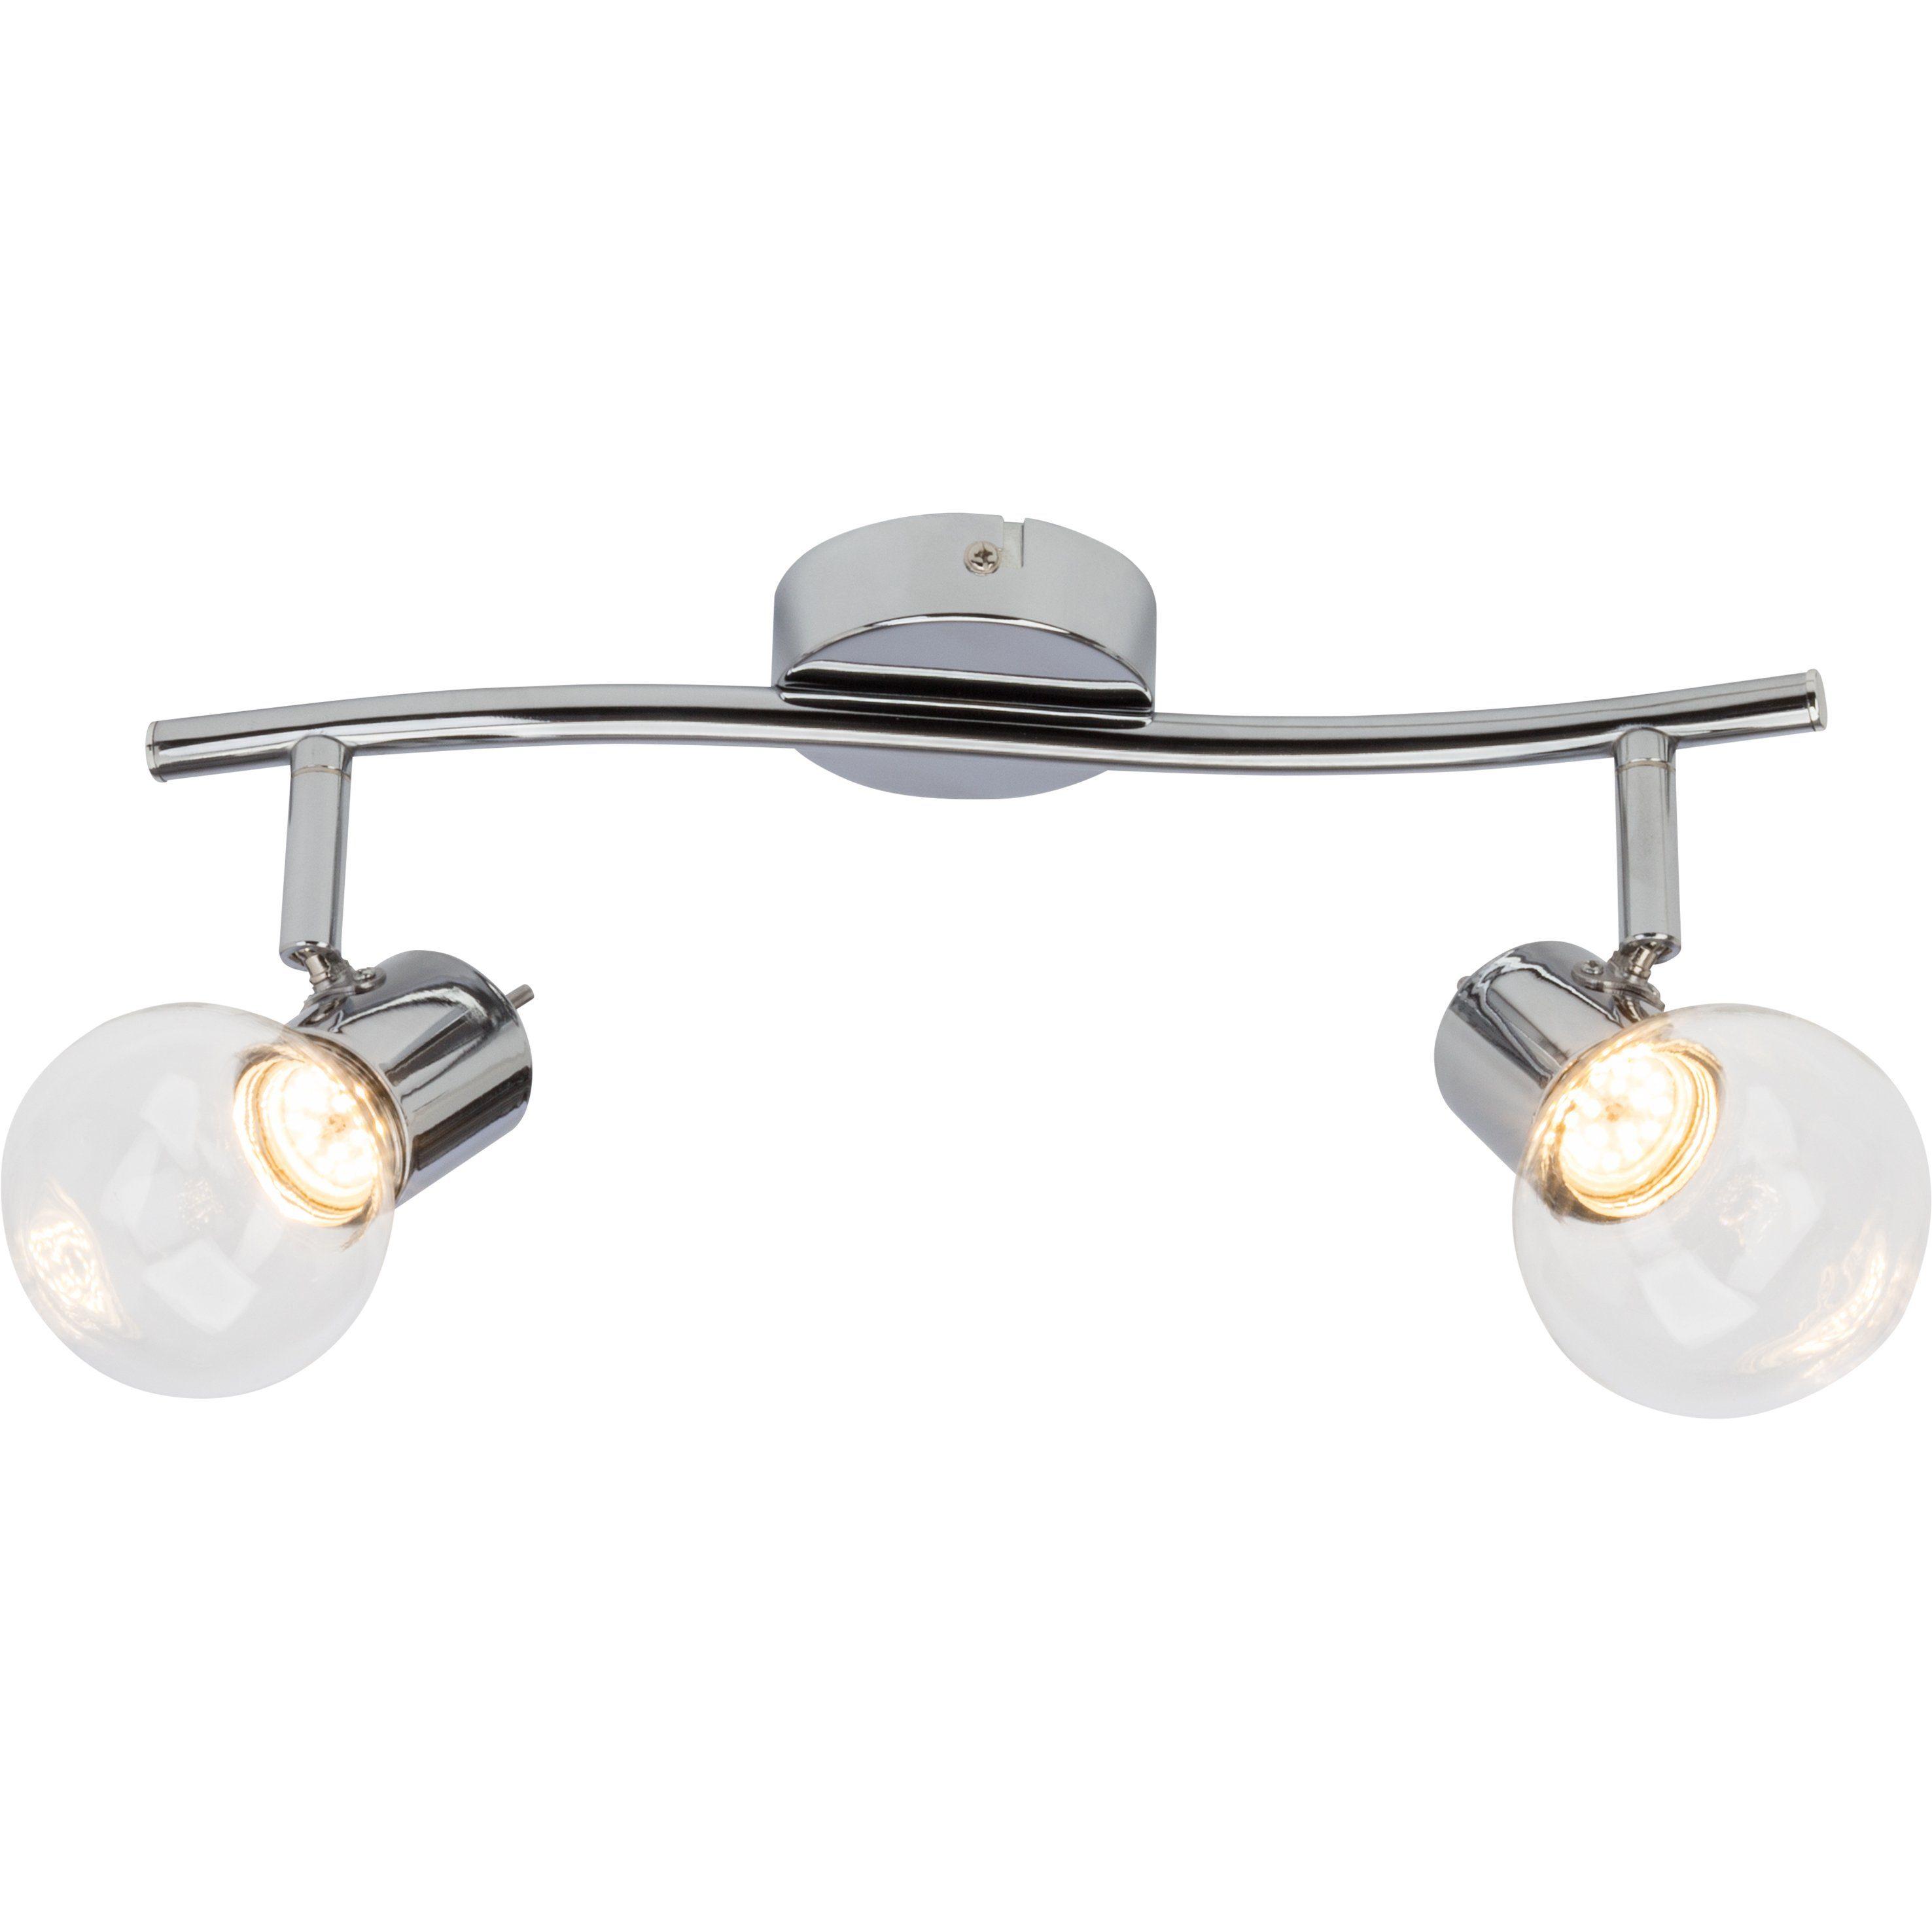 Brilliant Leuchten Celest LED Spotrohr, 2-flammig chrom/transparent